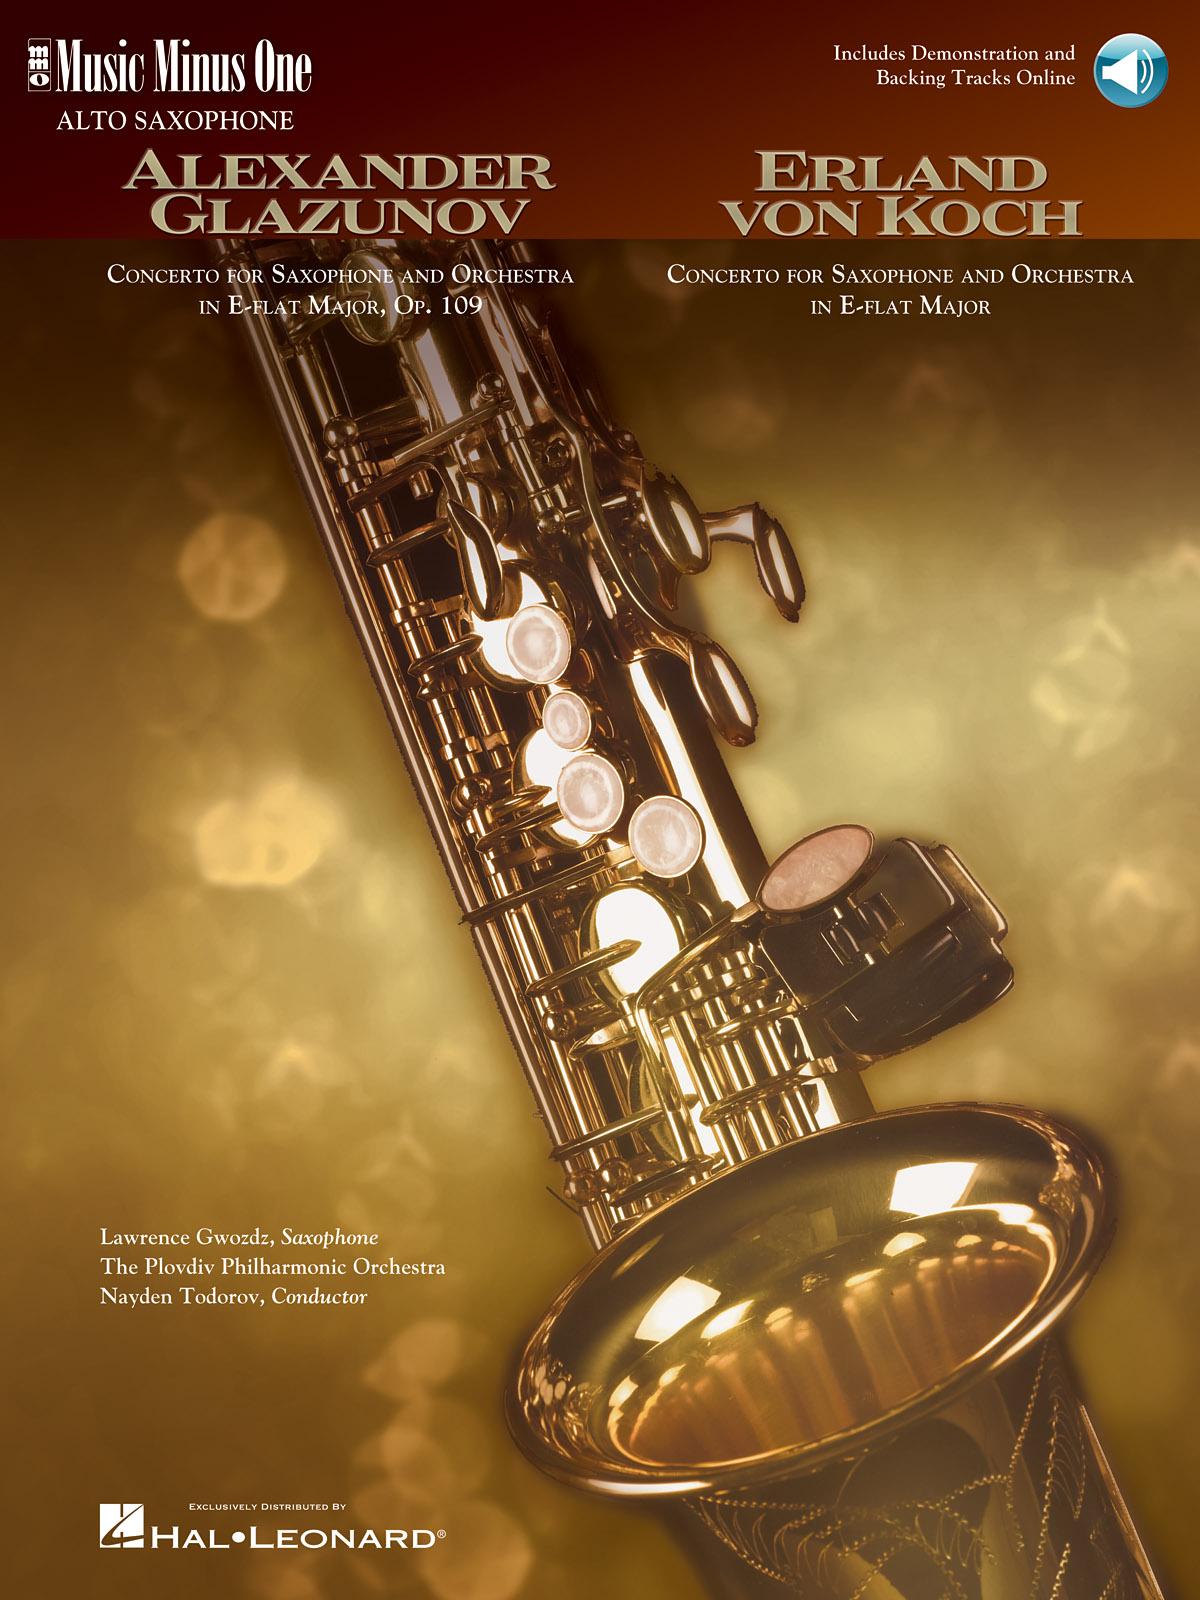 Alexander Glazunov Von Koch: Concerto in E-flat Major  Op. 109: Alto Saxophone: